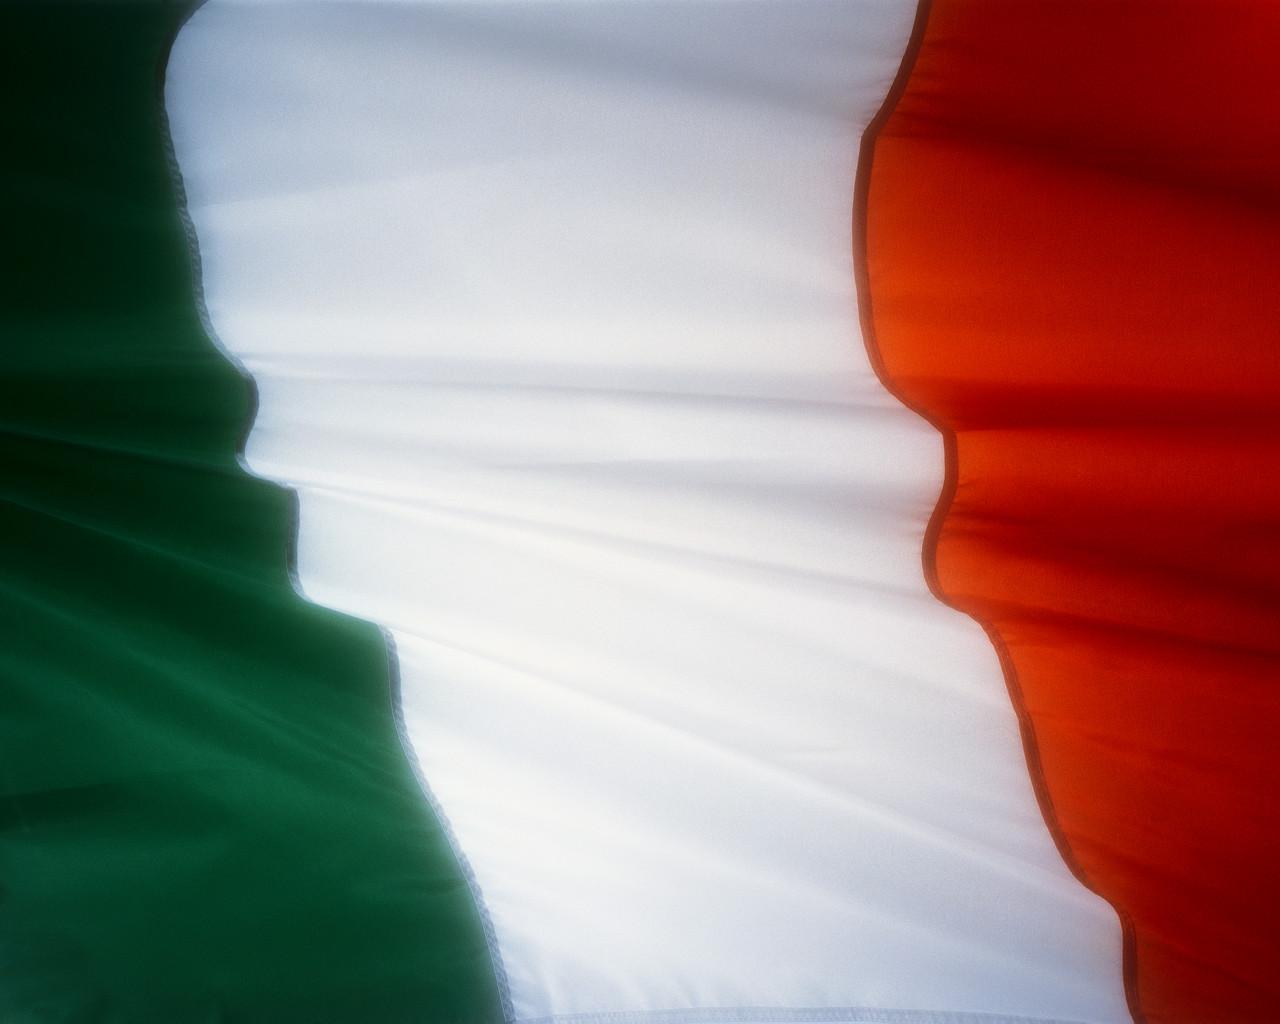 http://4.bp.blogspot.com/-S8_51bmluio/UNgTnFrUYHI/AAAAAAAABz0/s-BU-35CB8o/s1600/best+italian+flag+quality+hd+rate+9.jpg